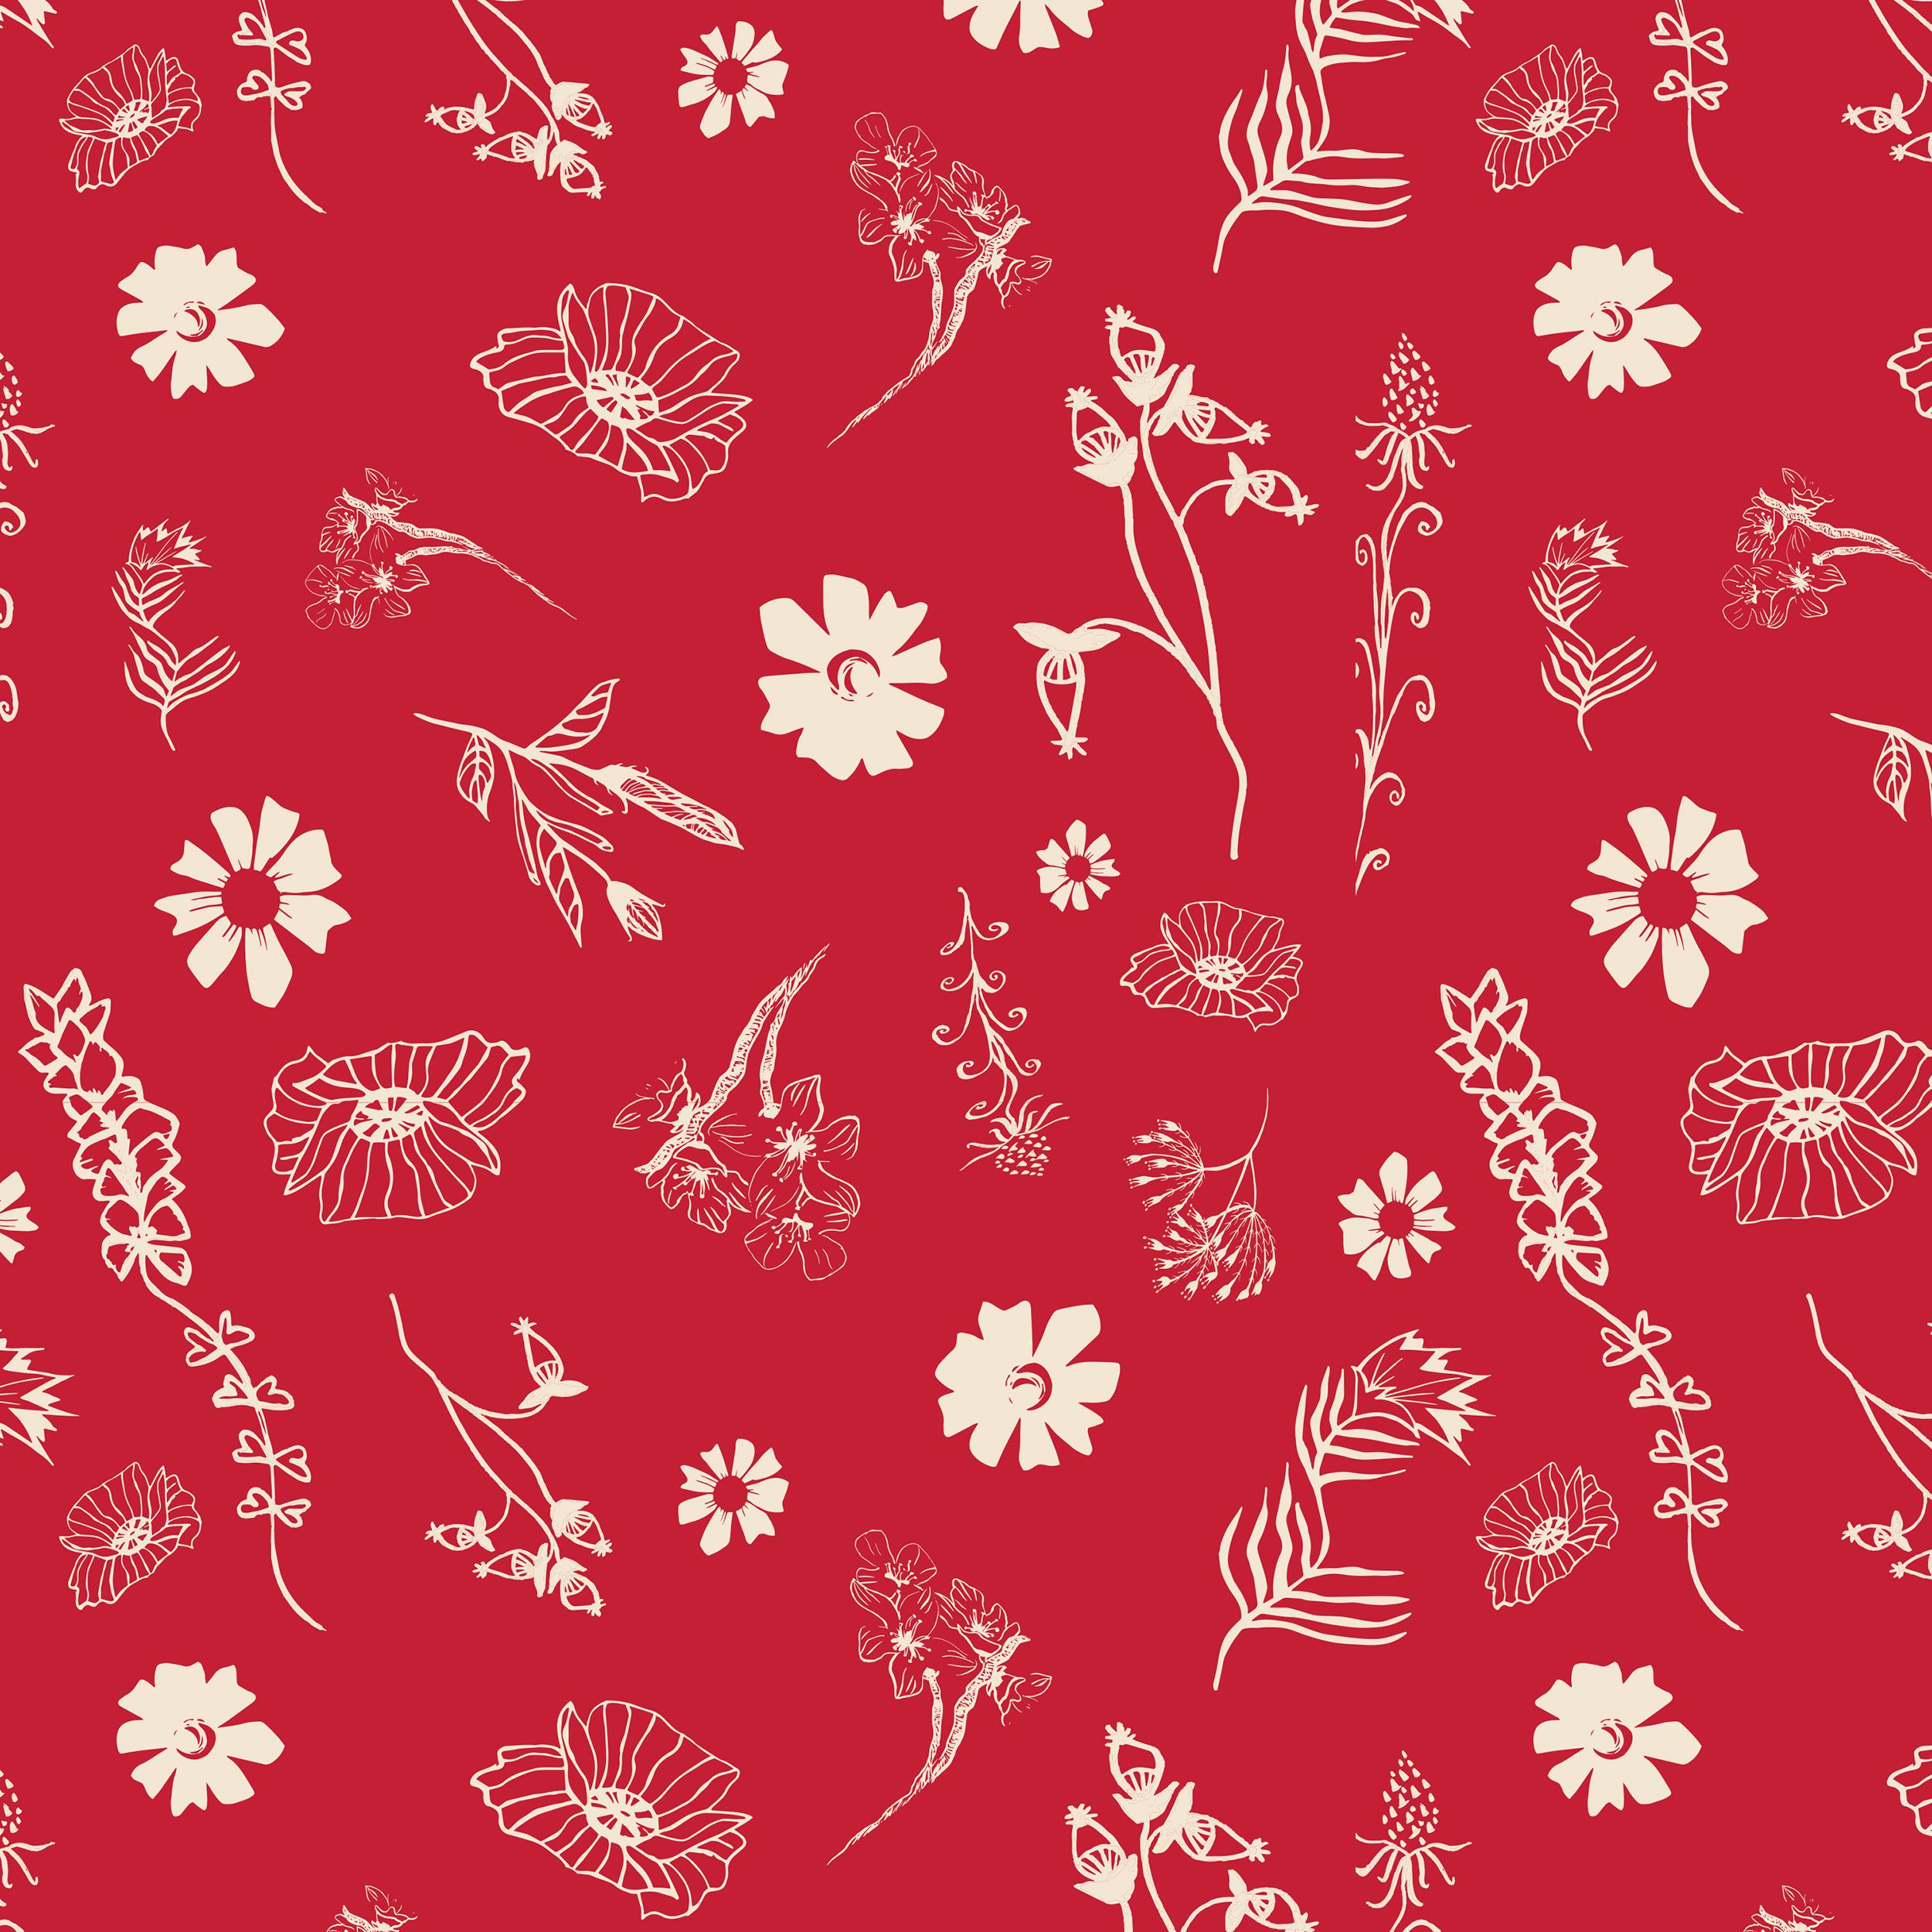 HomelandFloralSketch-red-PT.jpg